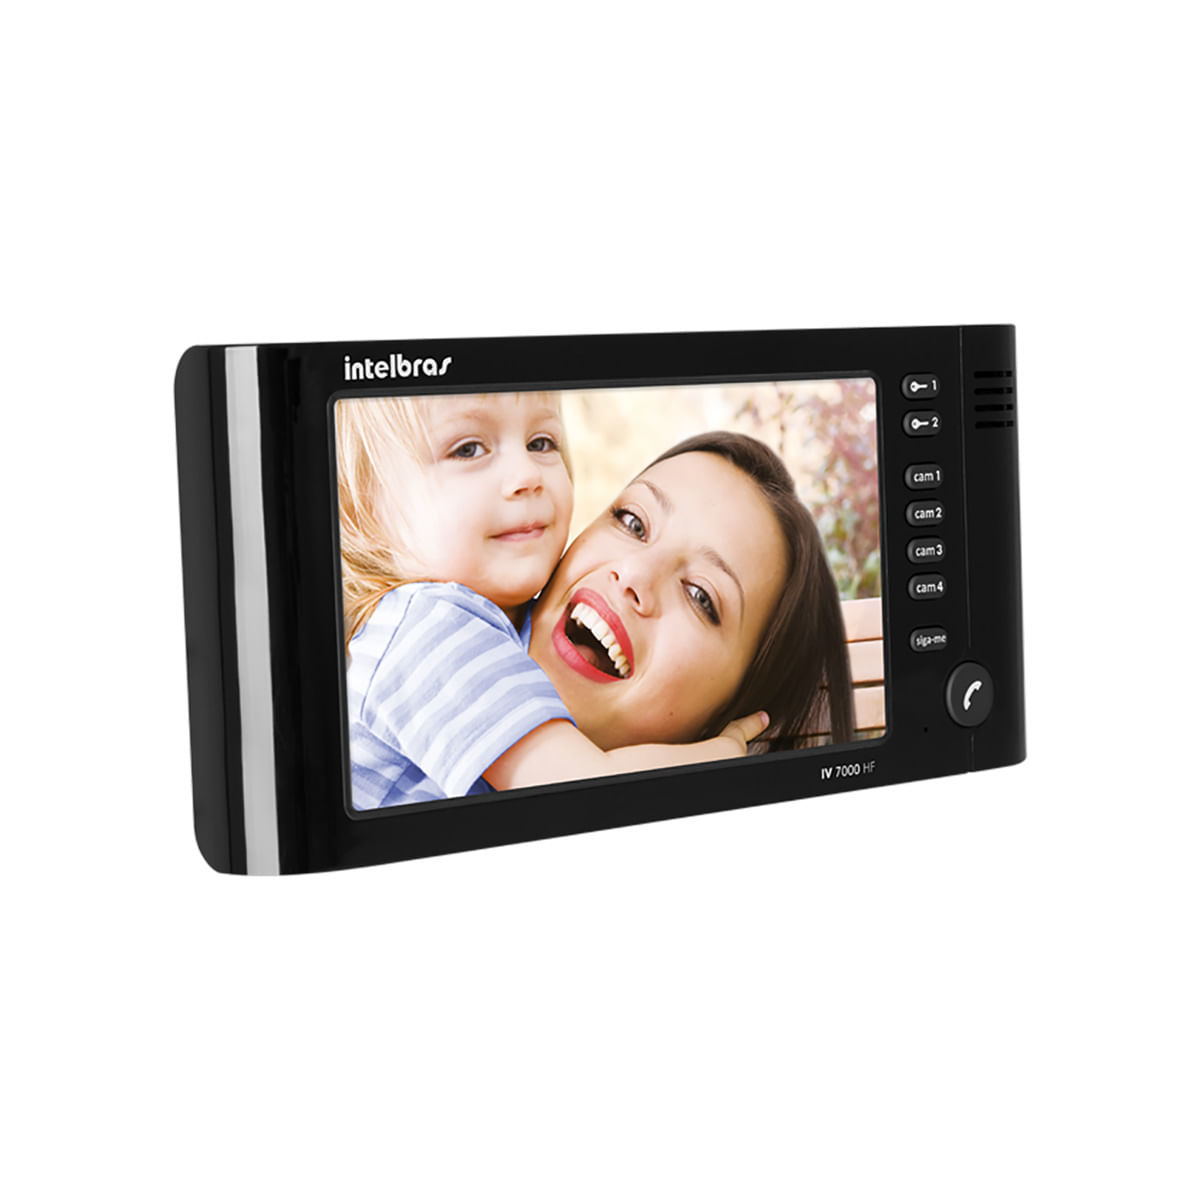 Módulo Interno Vídeo Porteiro Intelbras IV 7000 HF Preto